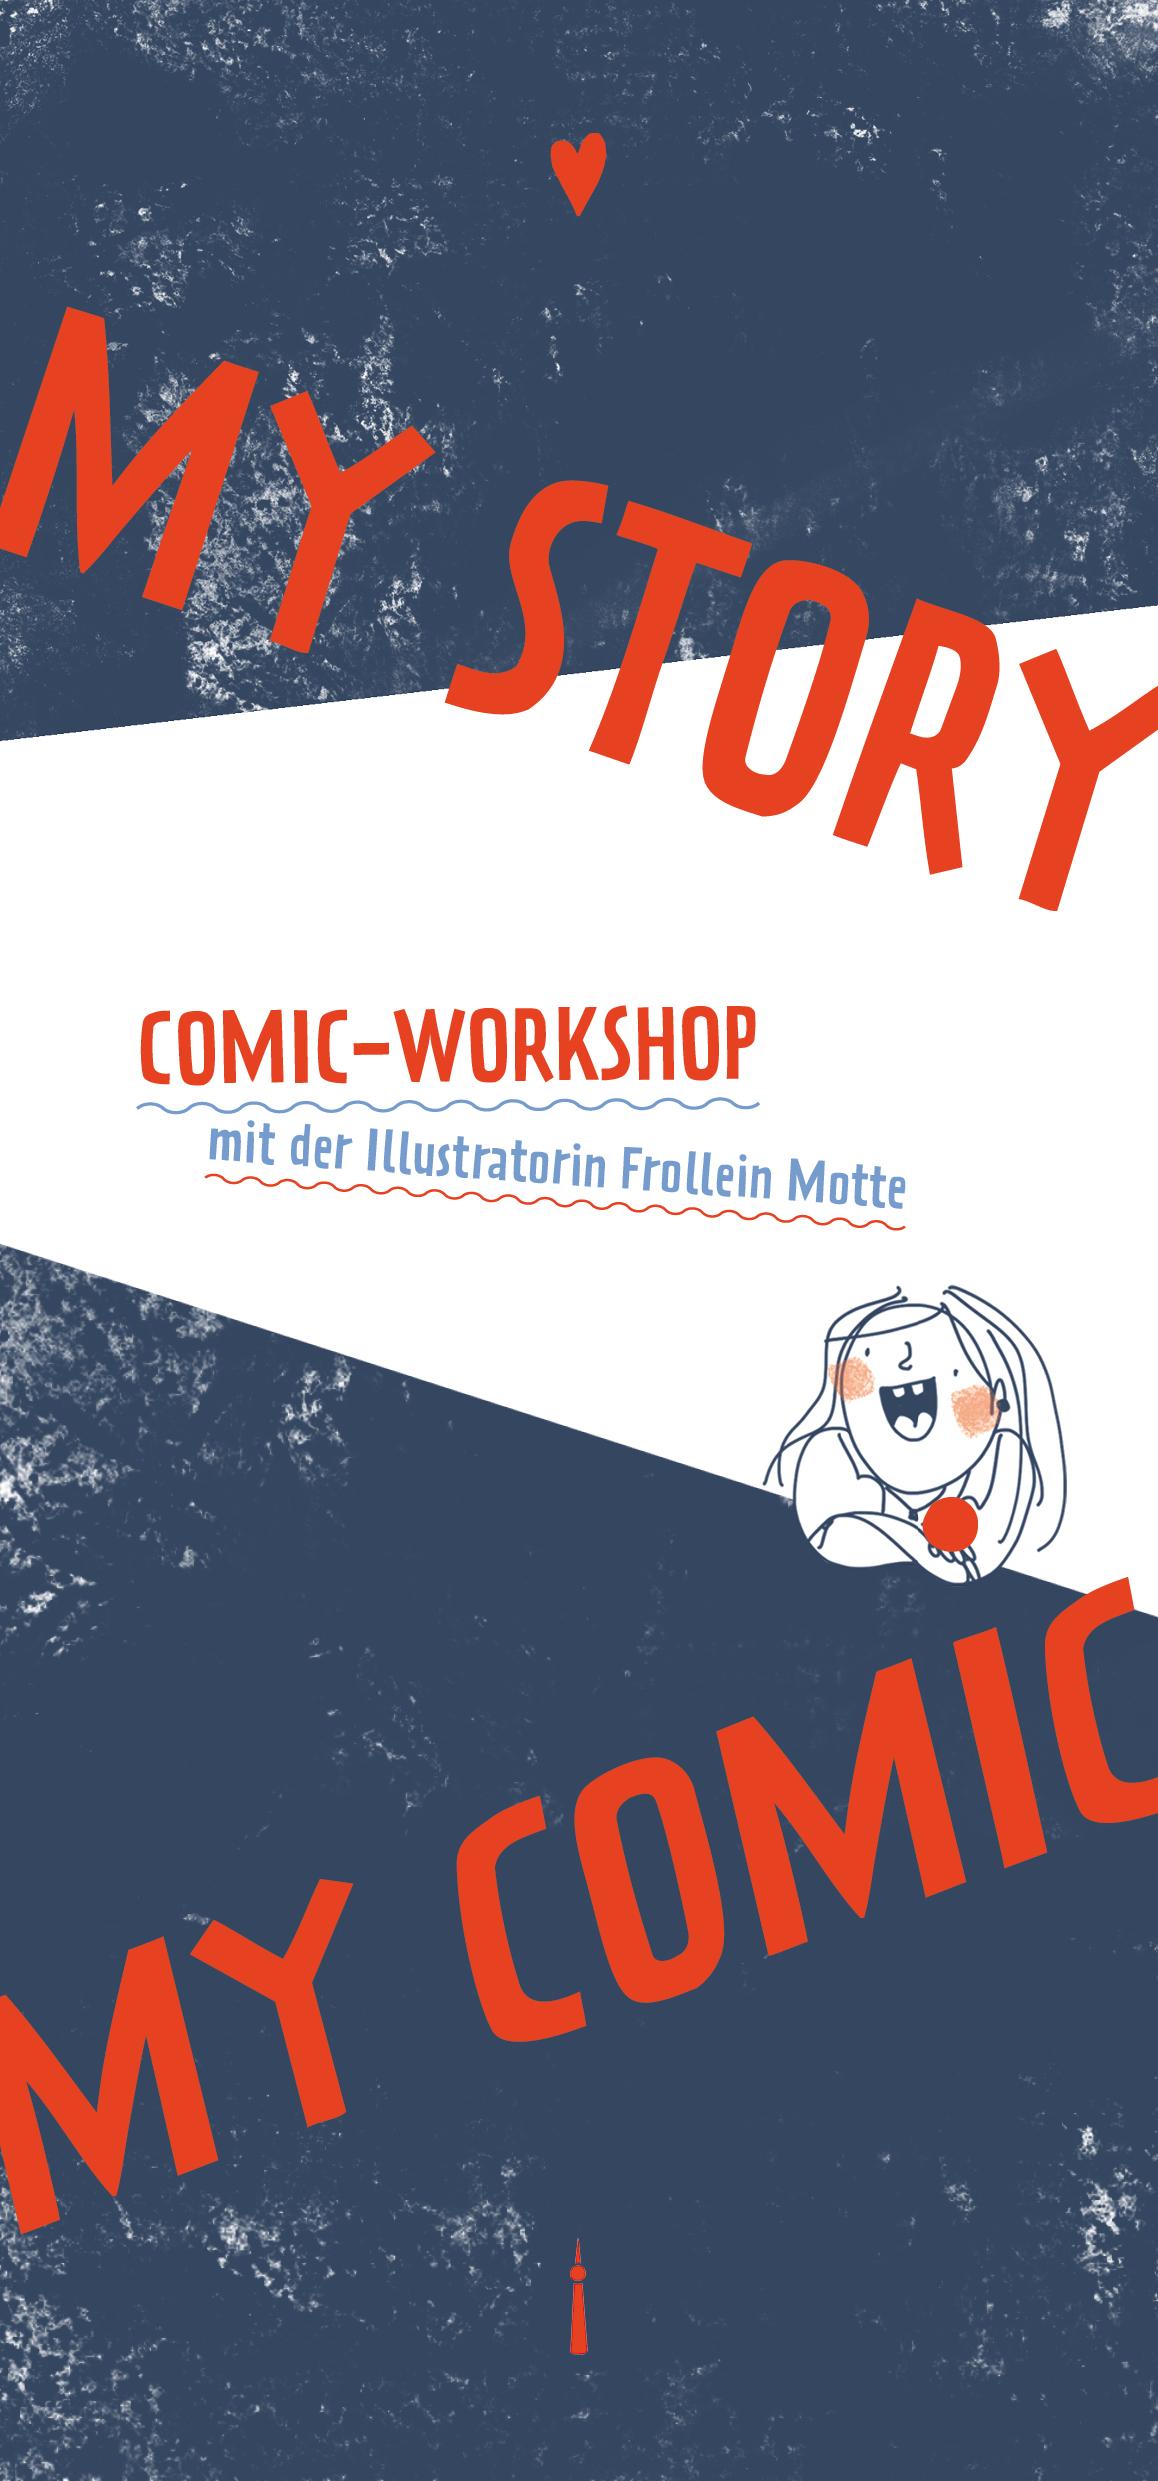 WS_werbung_comic-workshop_mystory.jpg